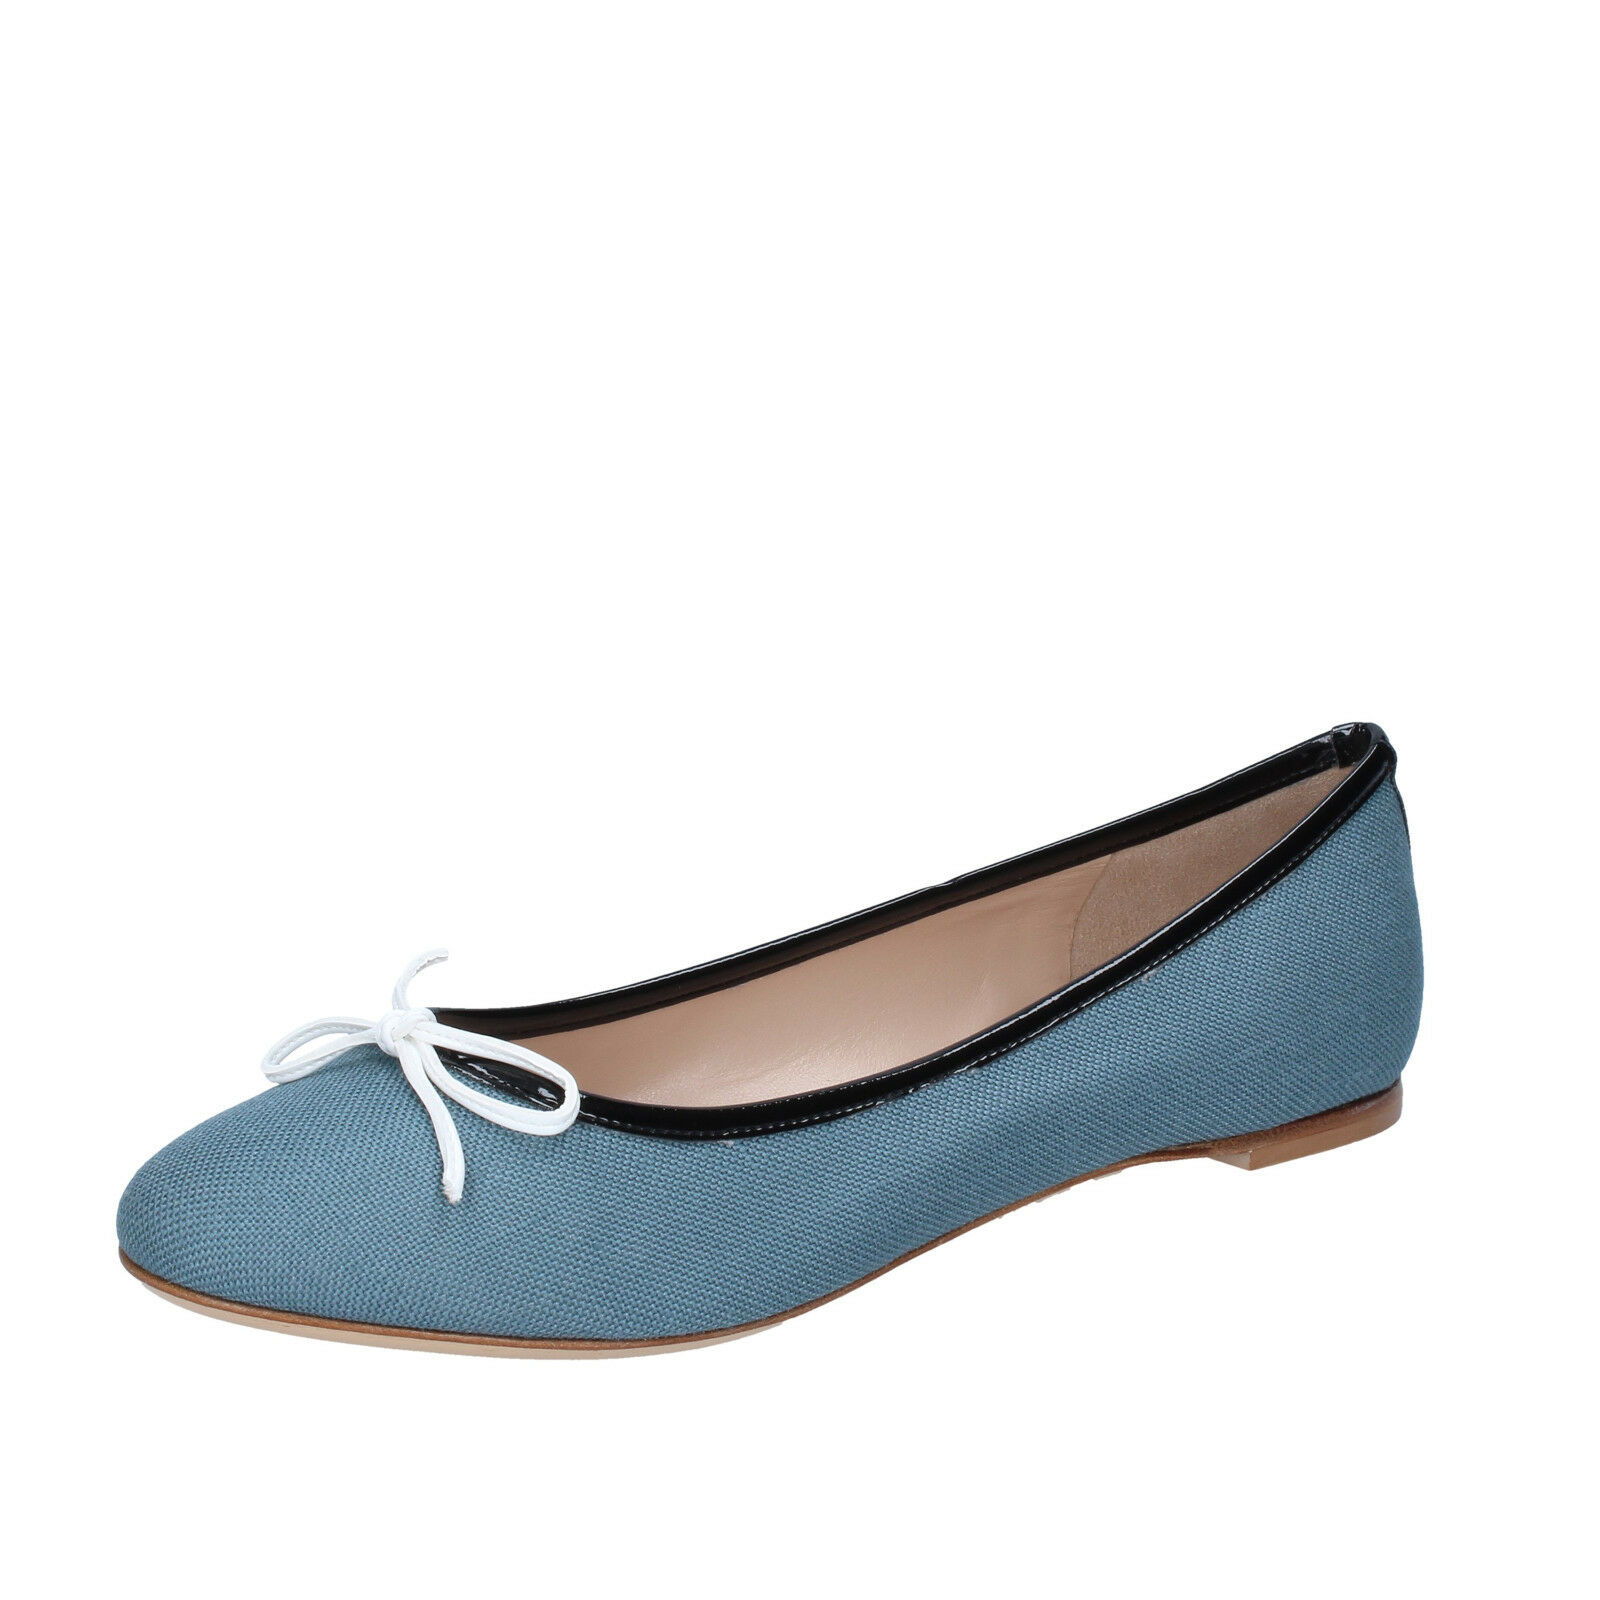 Womens shoes 18 KT 5 (EU 38) flats green oil textile BS164-38